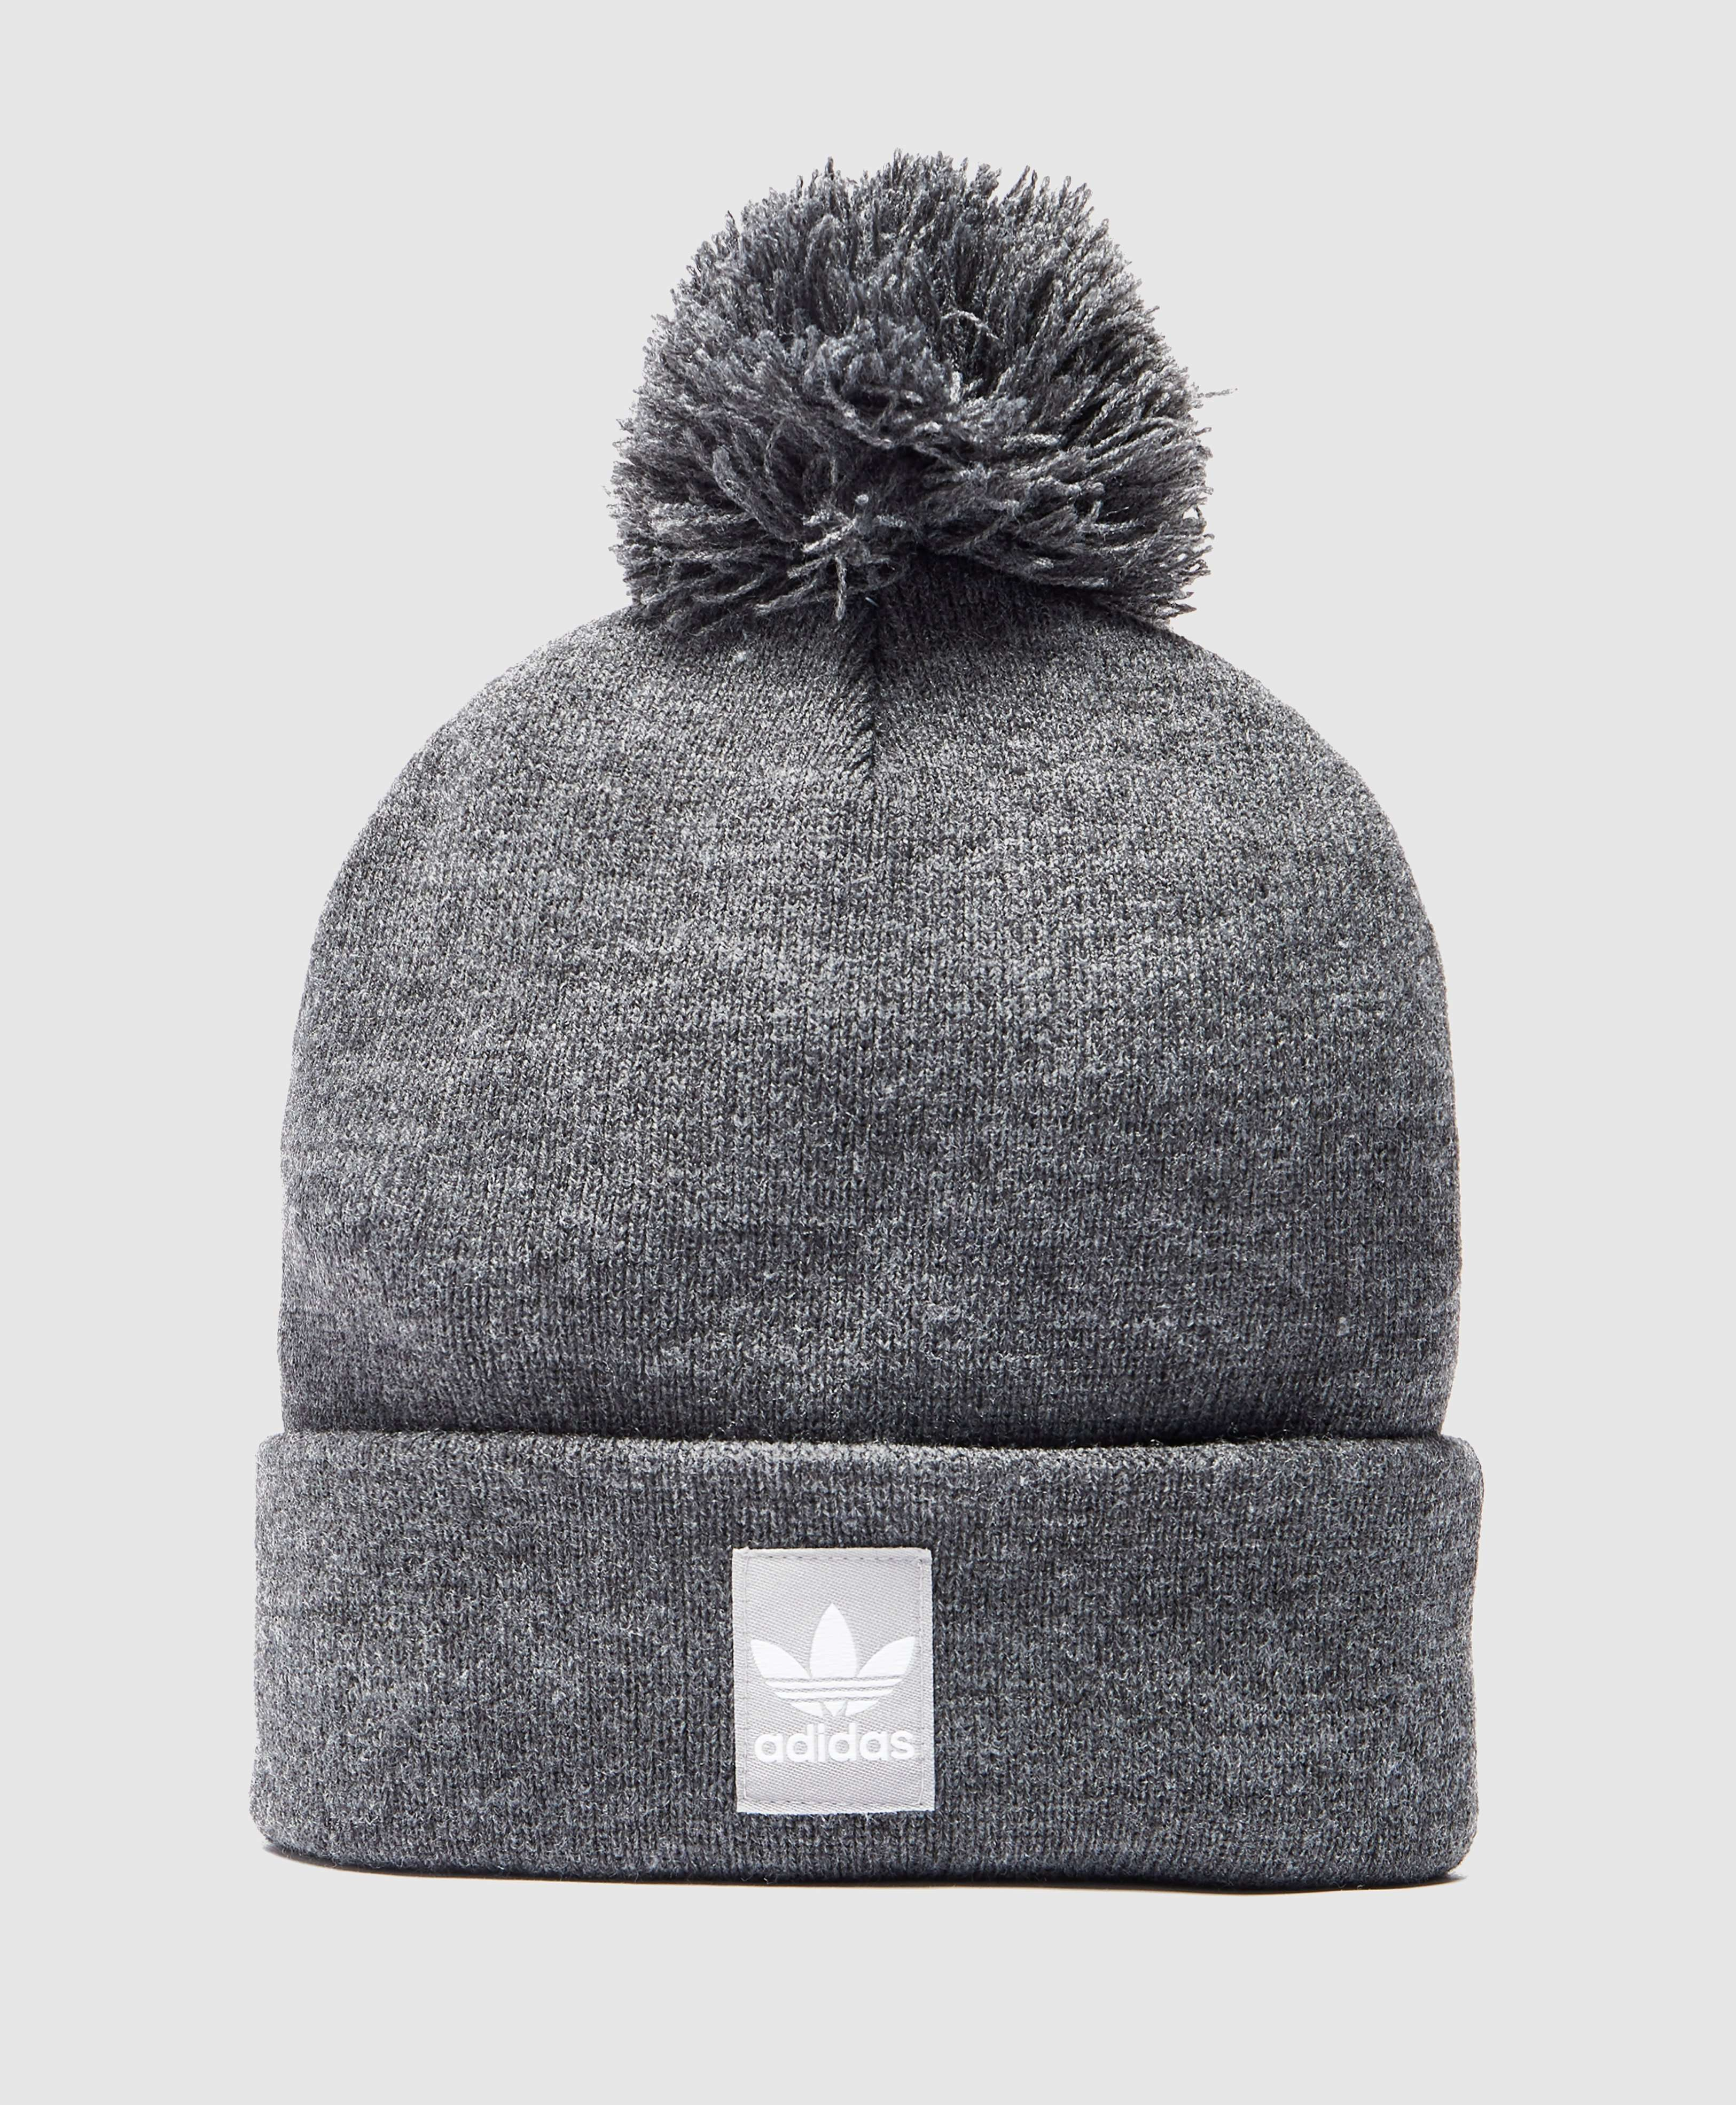 43243dc74 adidas Originals Logo Bobble Hat   scotts Menswear